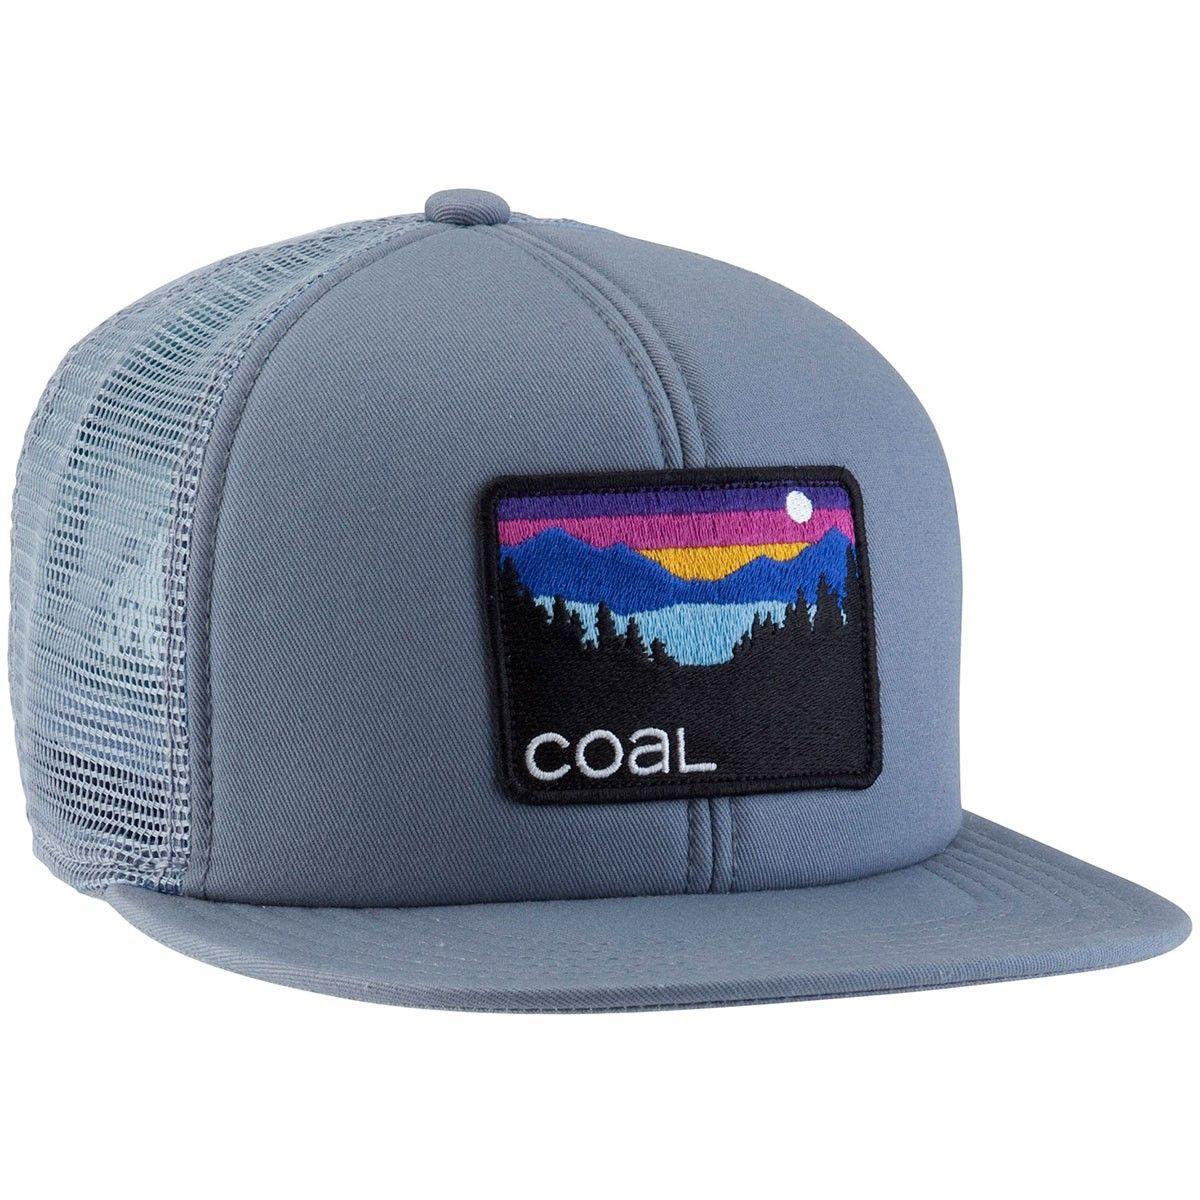 coal the hauler hat grey the hauler from coal is airy